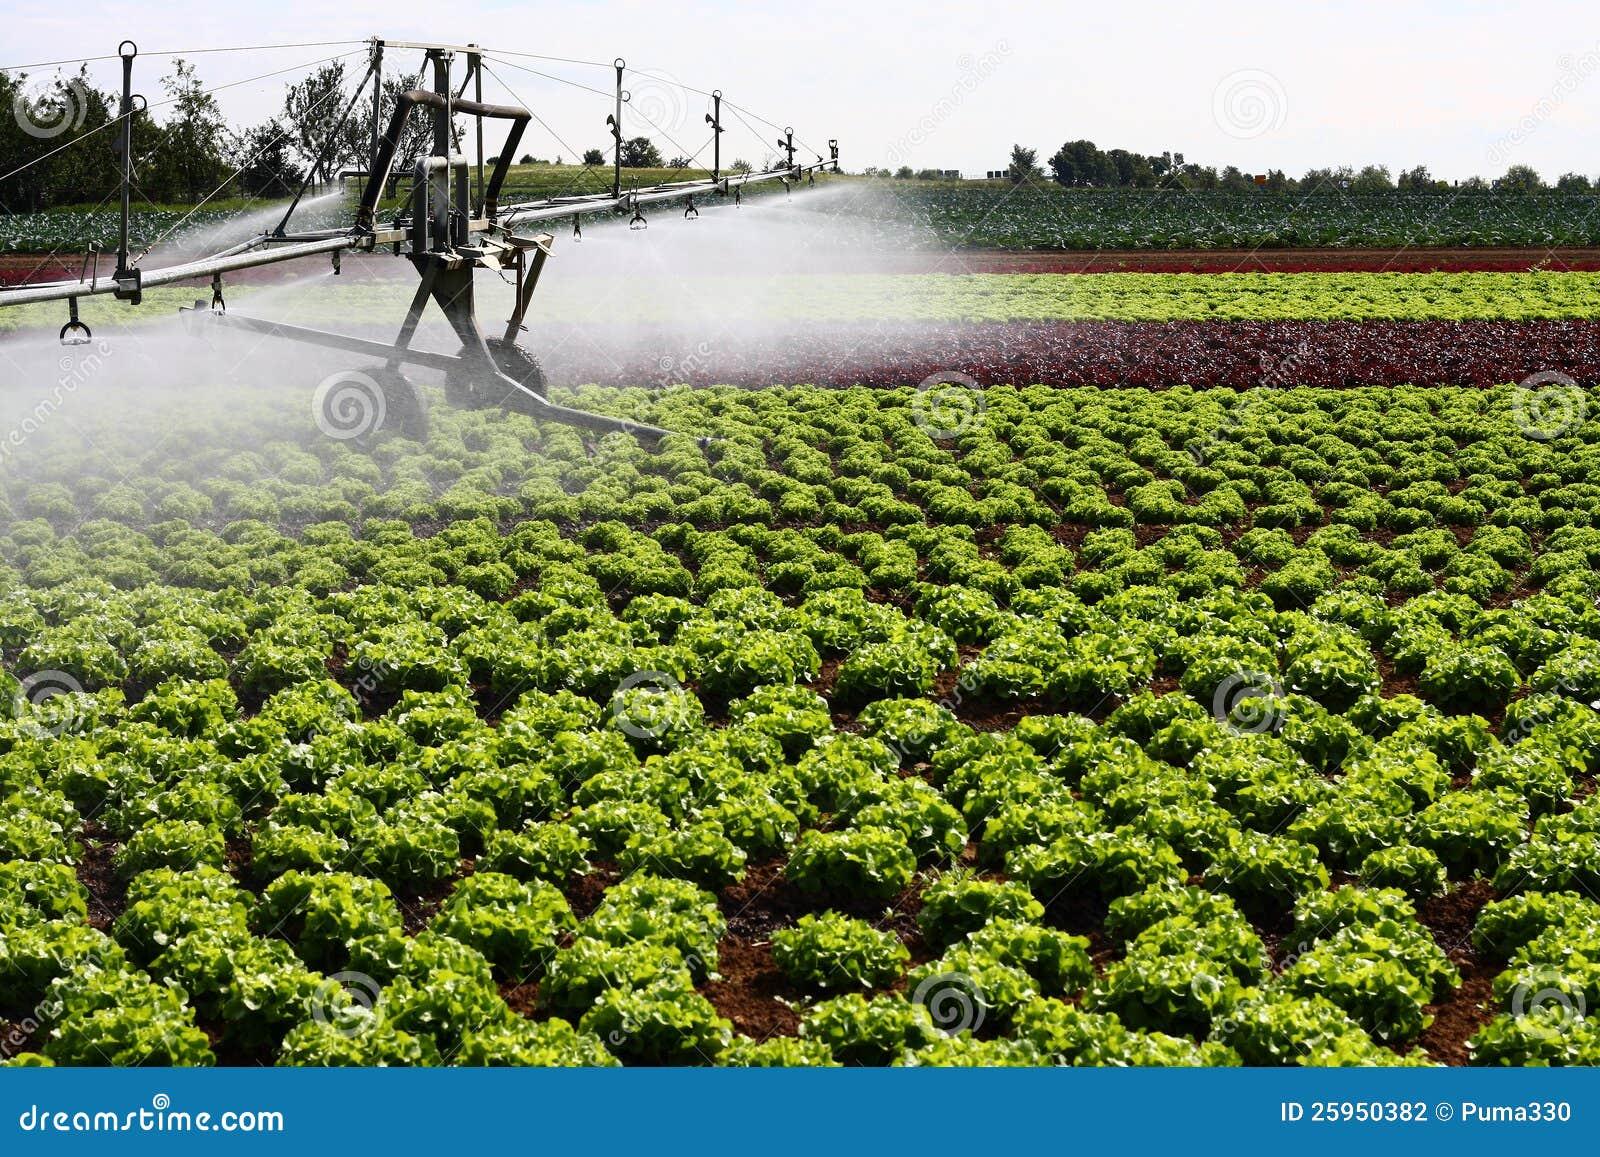 Modern Irrigation System Stock Photography - Image: 25950382